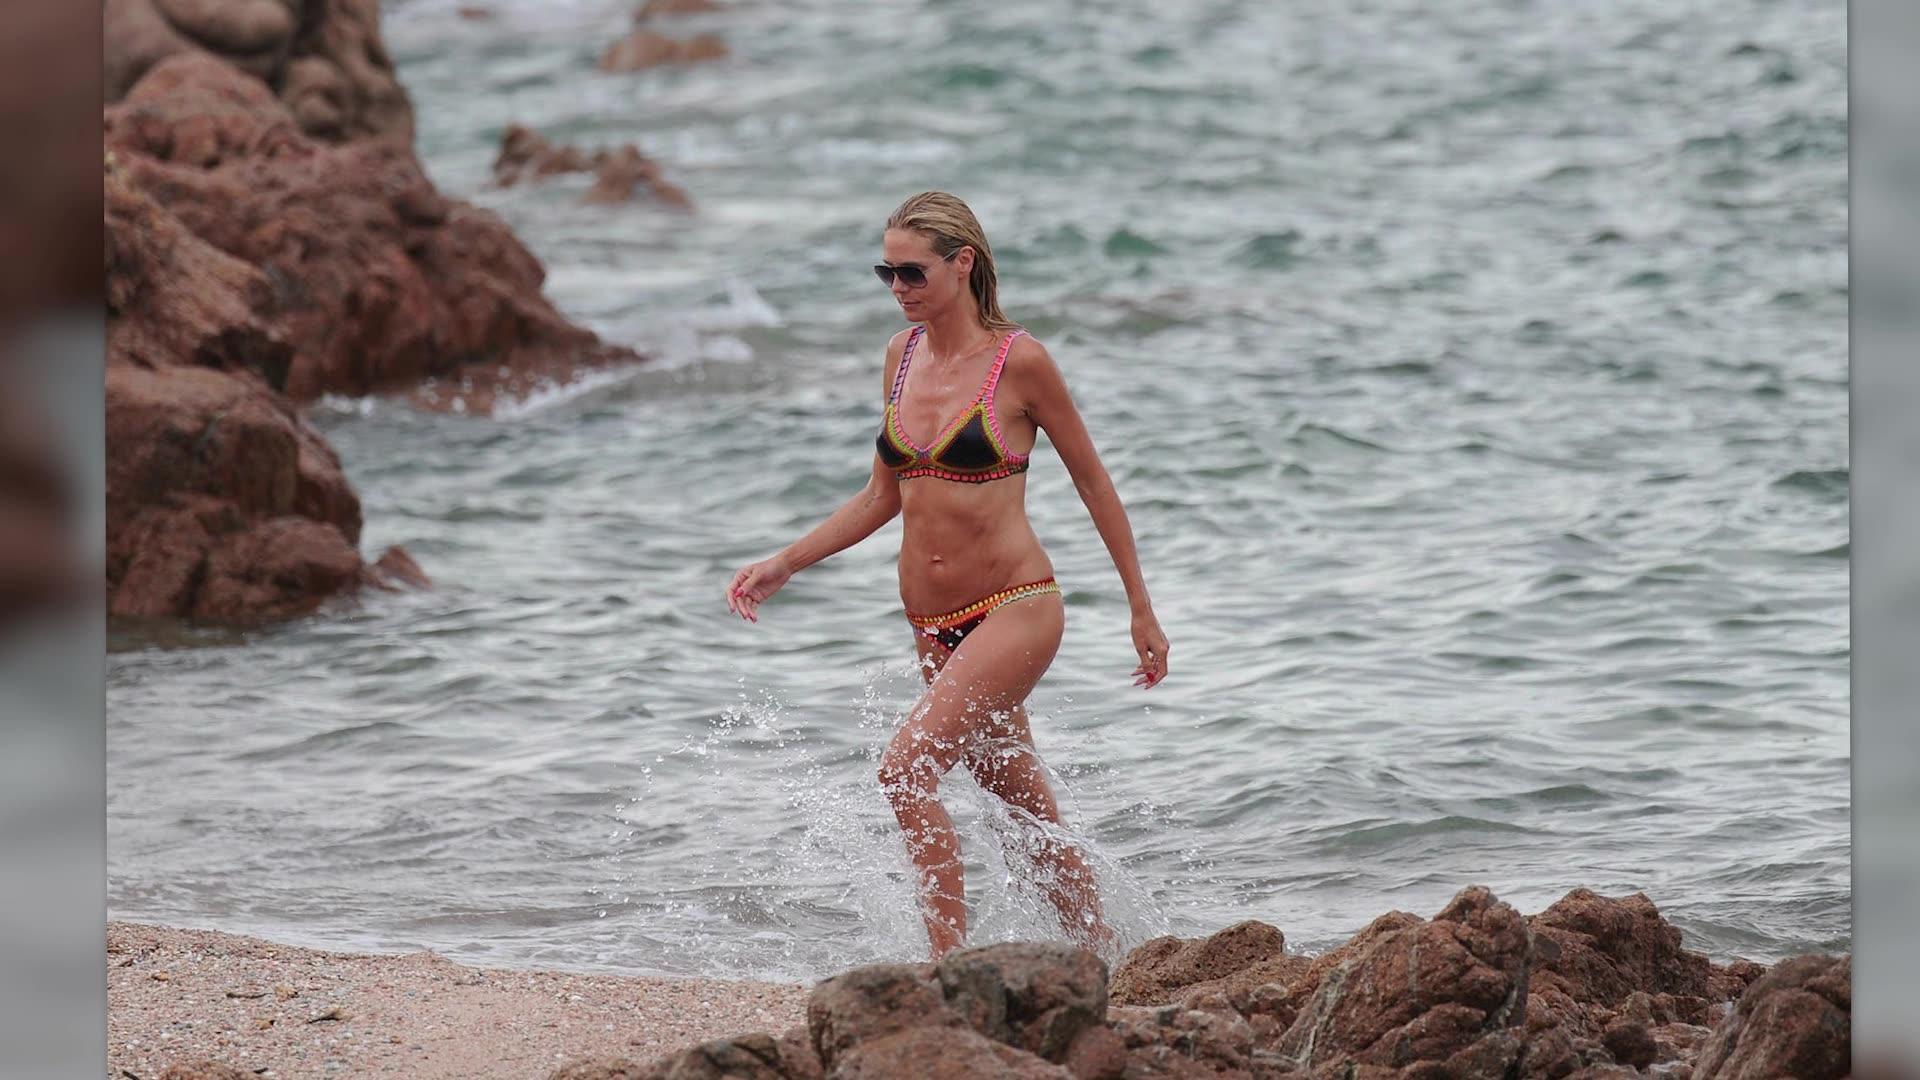 Bikini-Clad Heidi Klum Shows Off PDA on Secluded Italian Beach